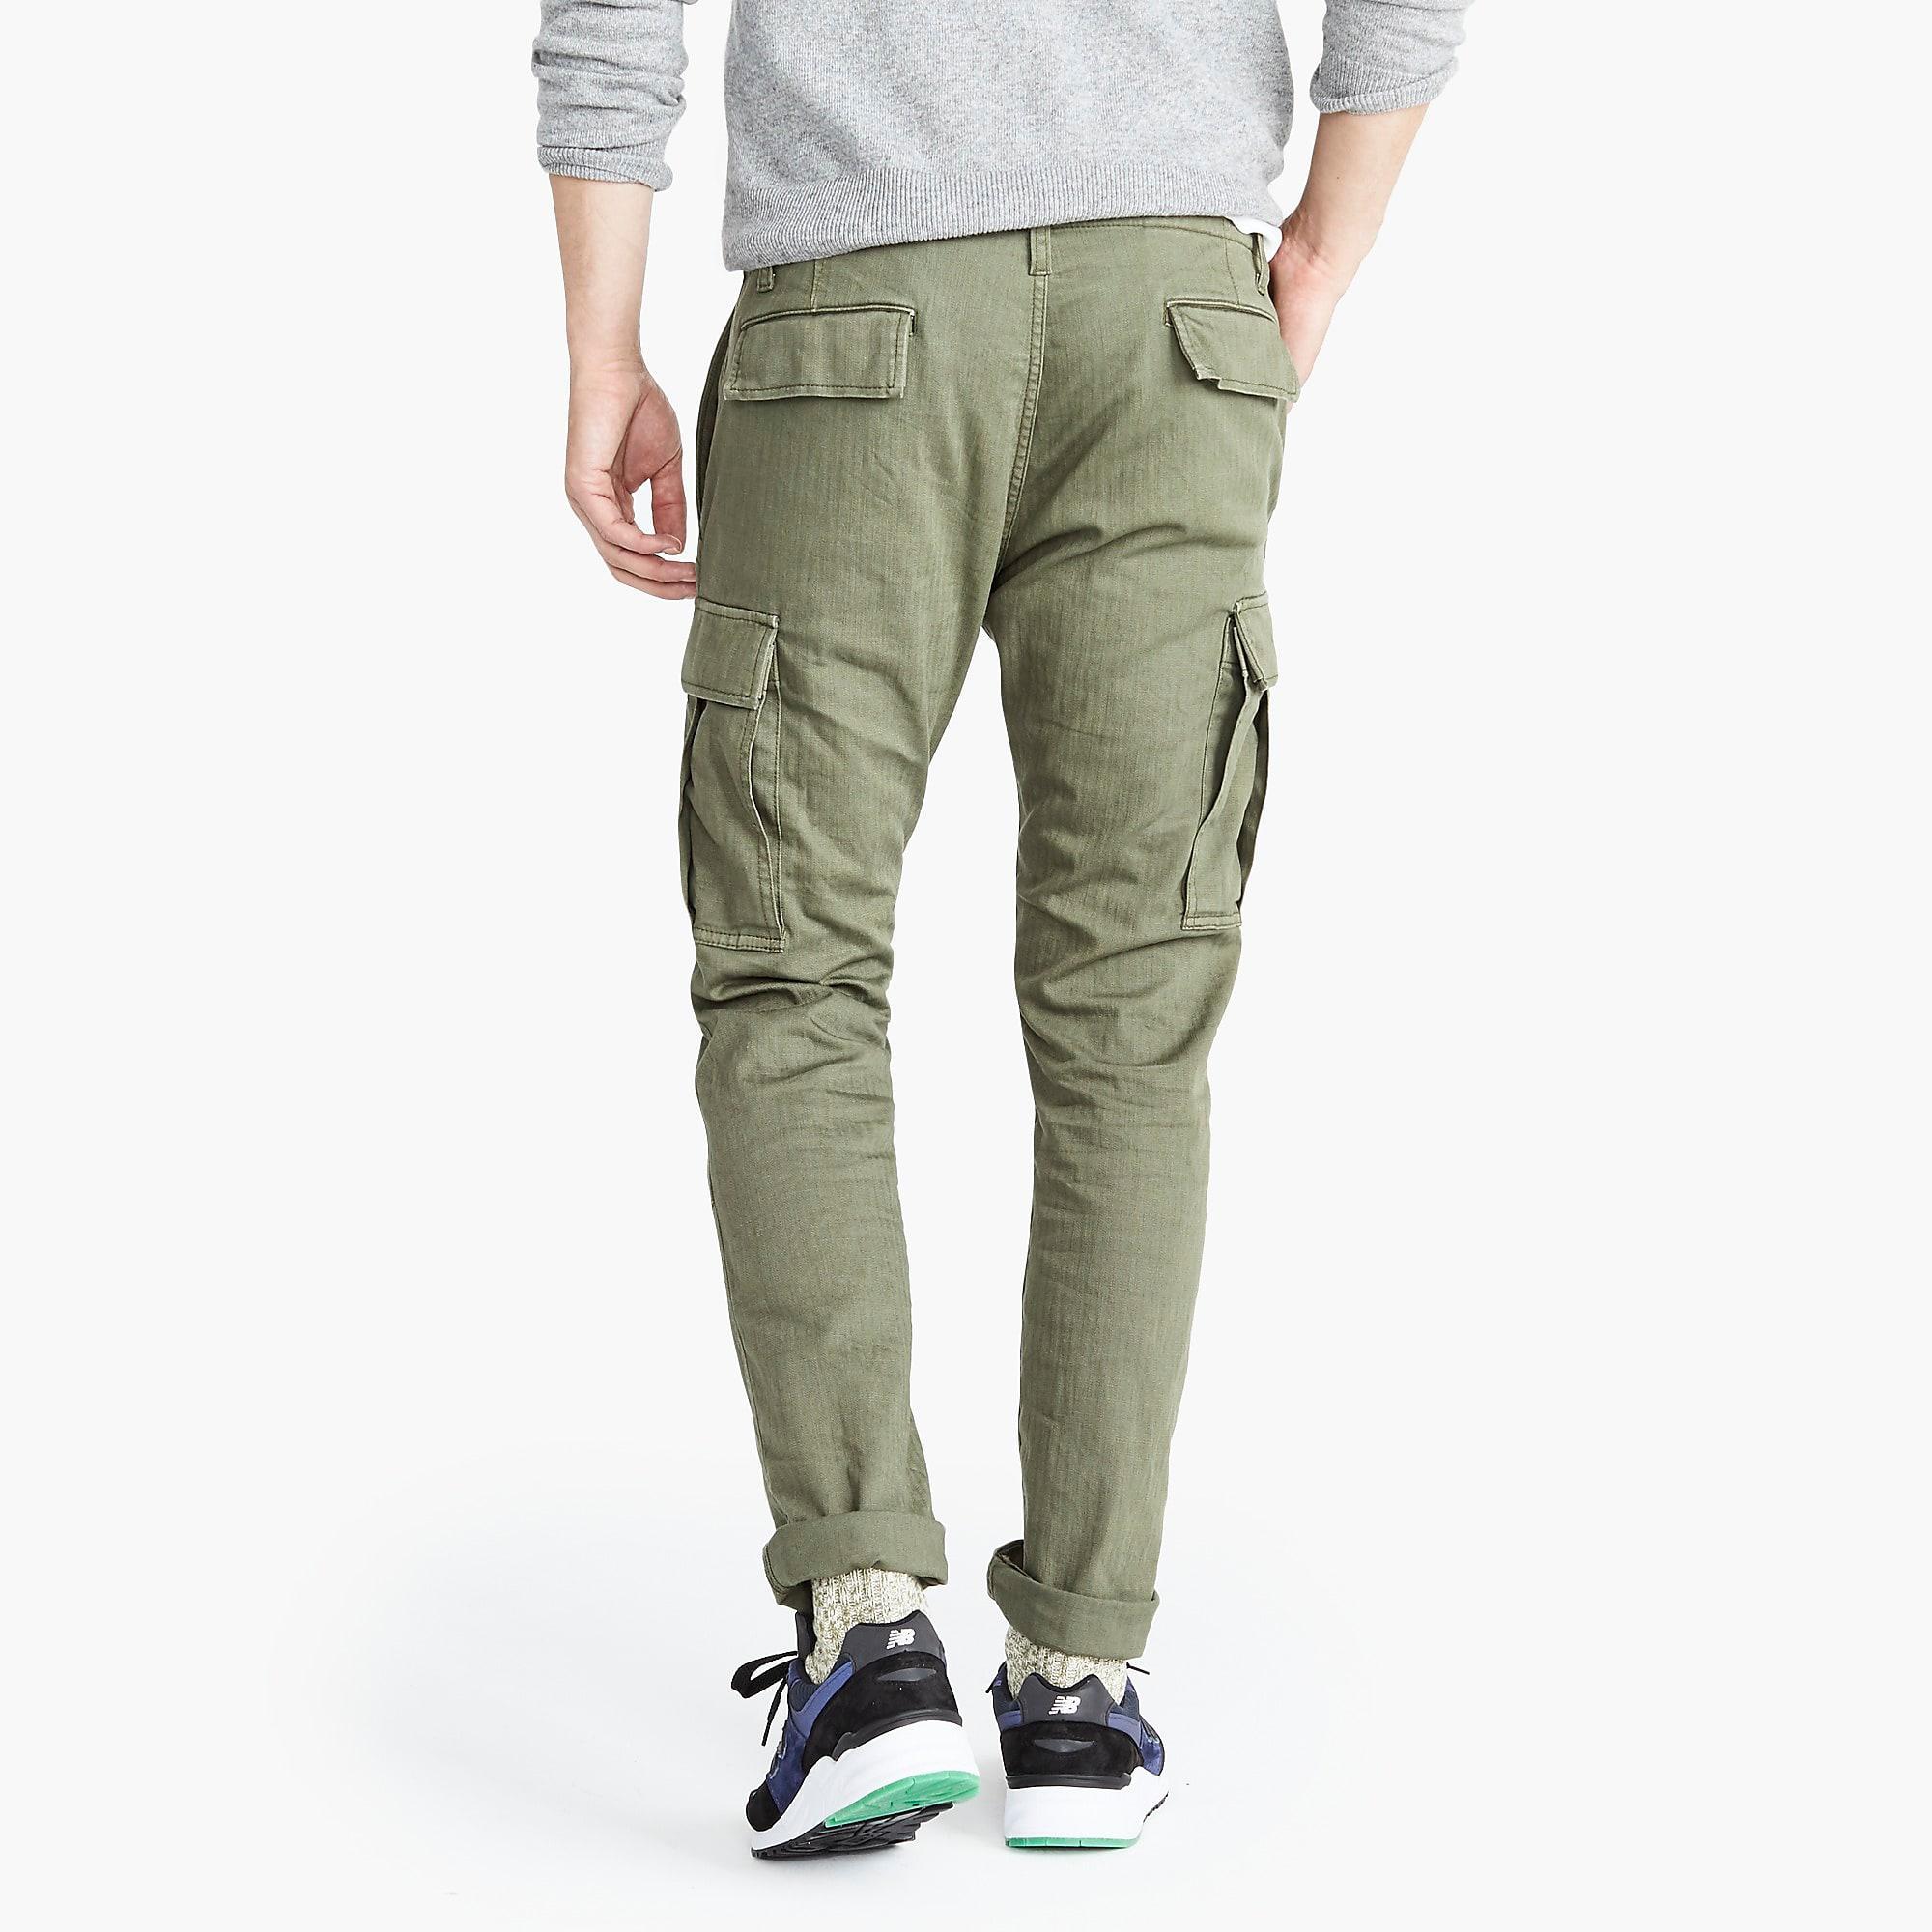 8417497fbb J.Crew Slim Fit Cargo Trousers in Green for Men - Lyst